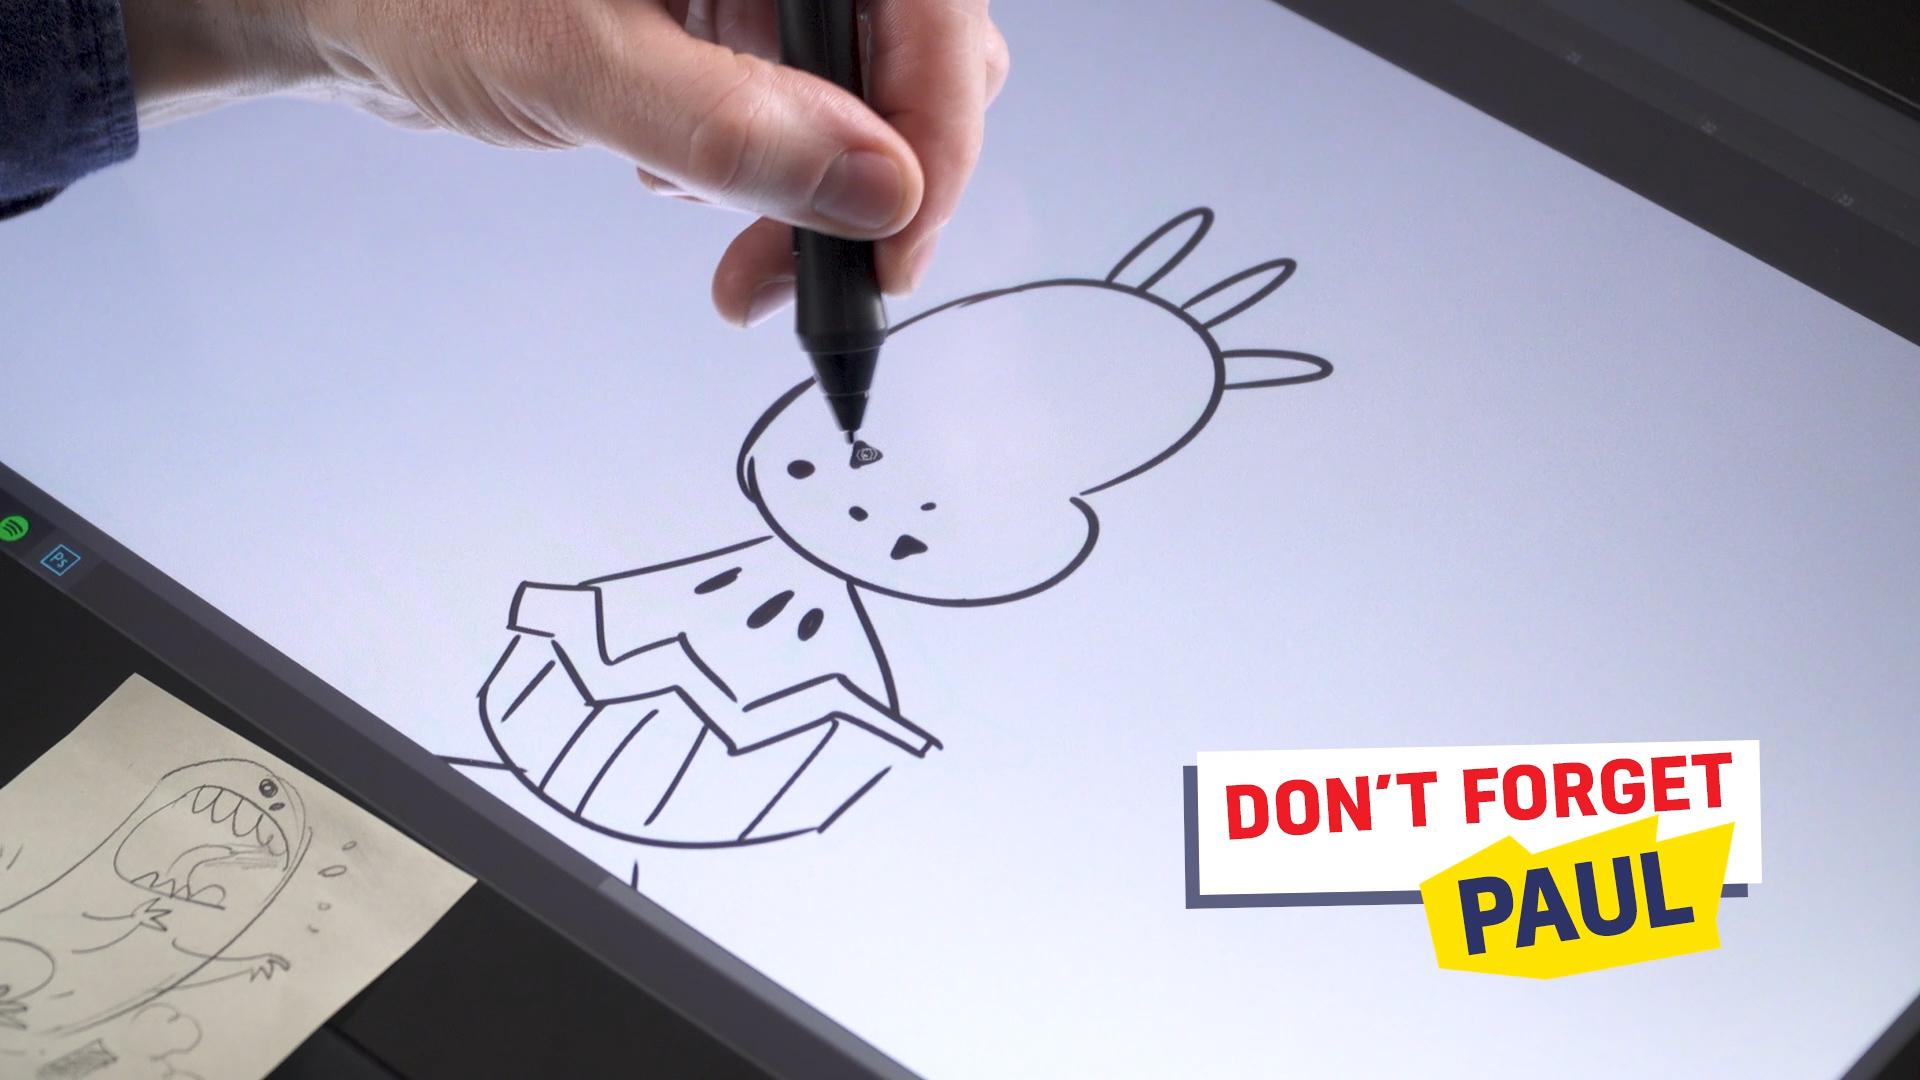 Ross drawing Paul the potato